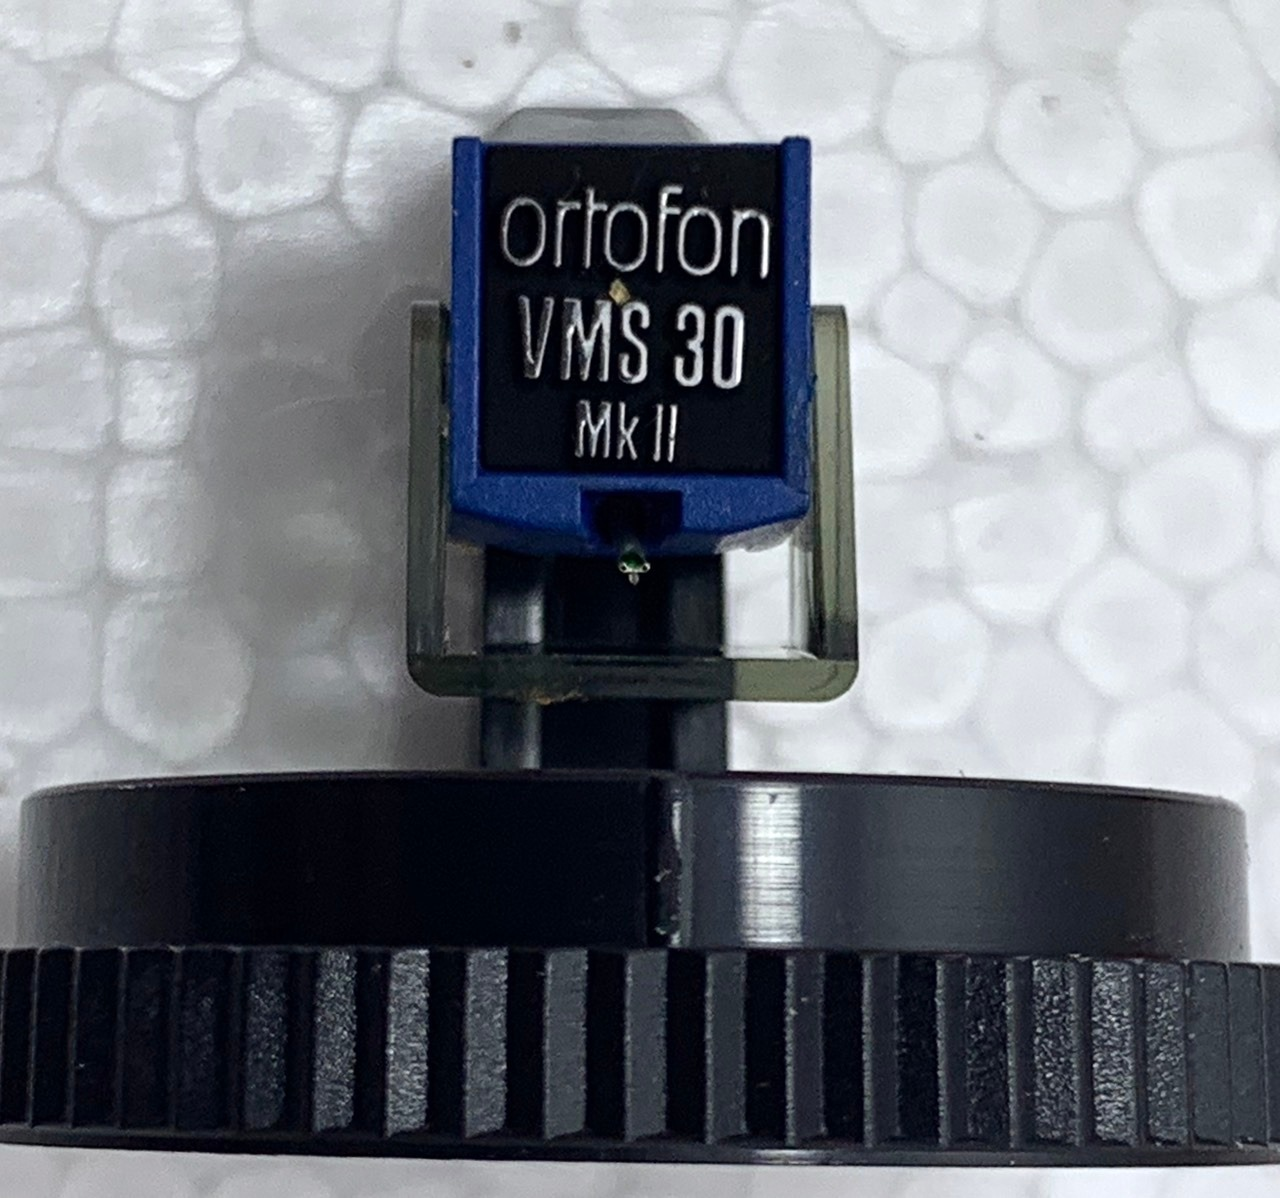 dau-kim-stylus-ortofon-vms-30-mkii